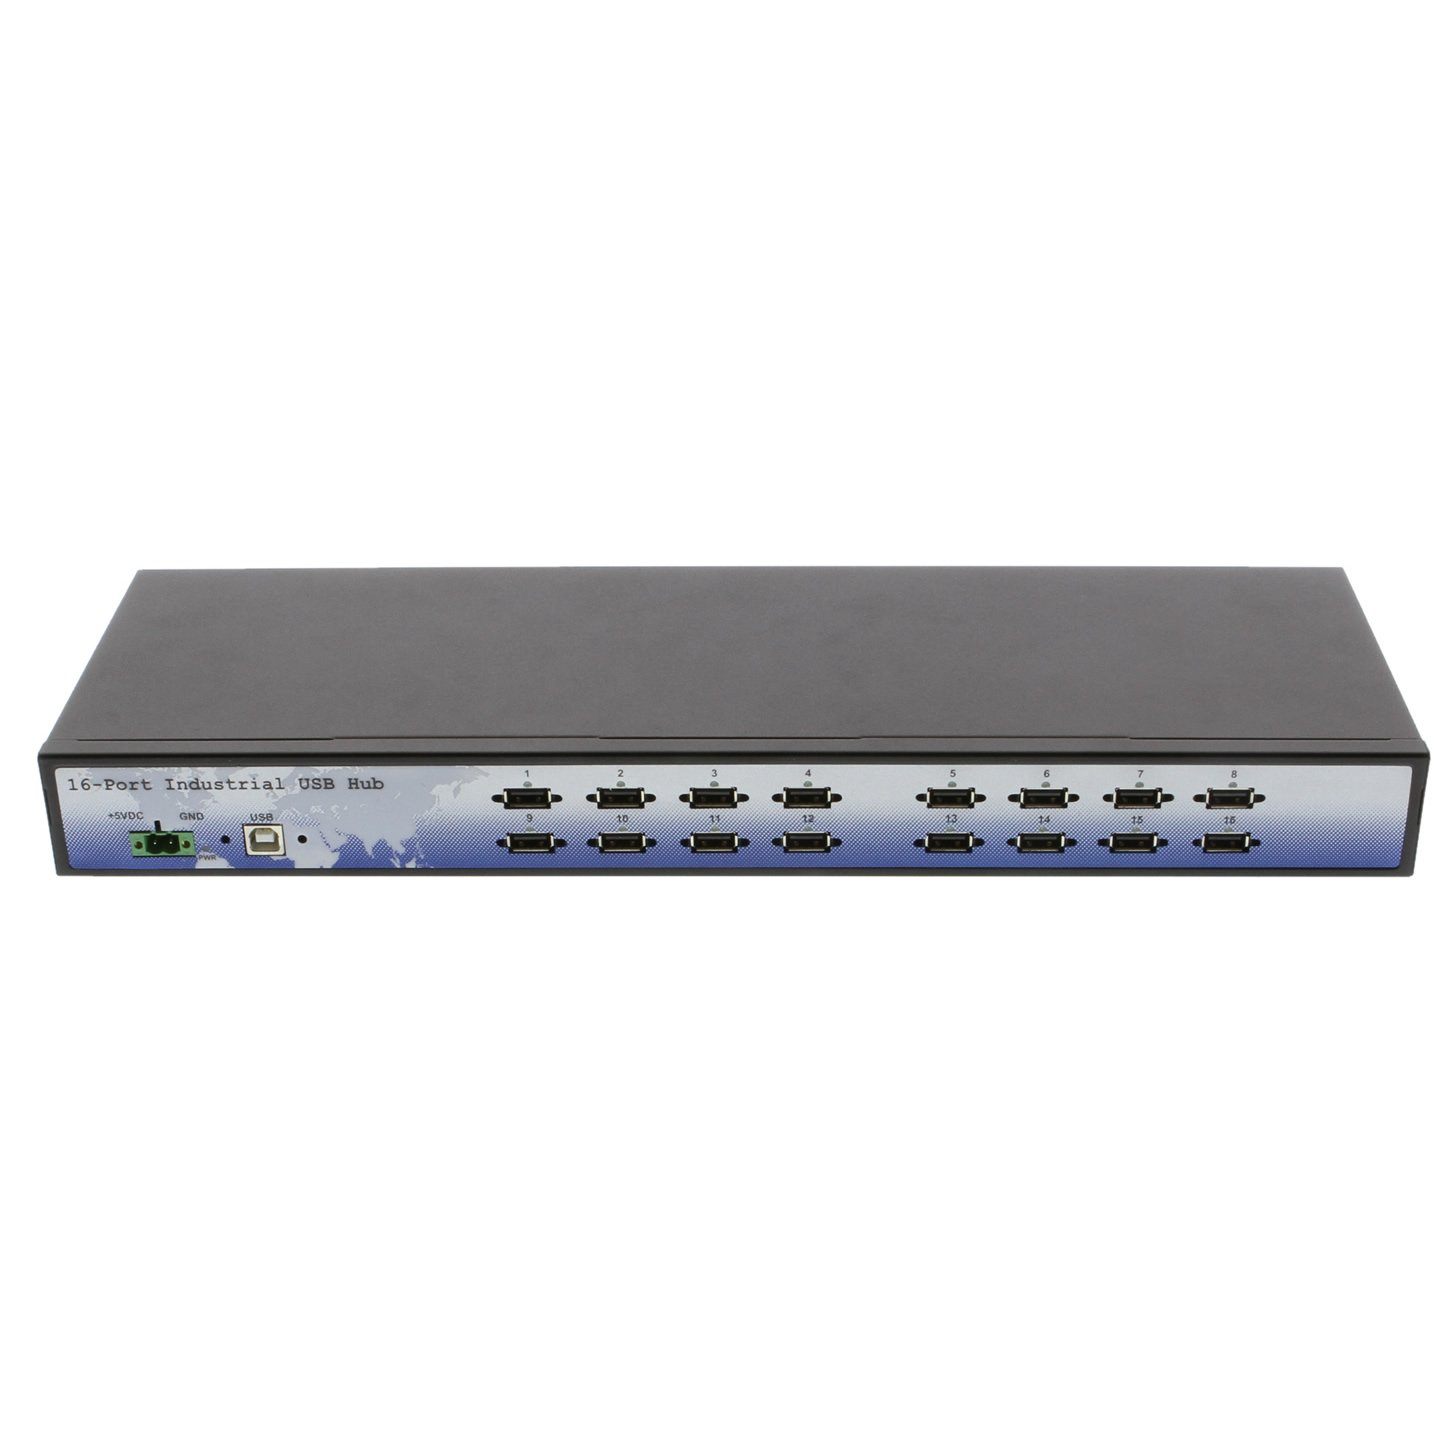 Coolgear CoolGear Industrial 16 Port Rack Mountable USB 2.0 Hub, Built in Internal Power Supply.